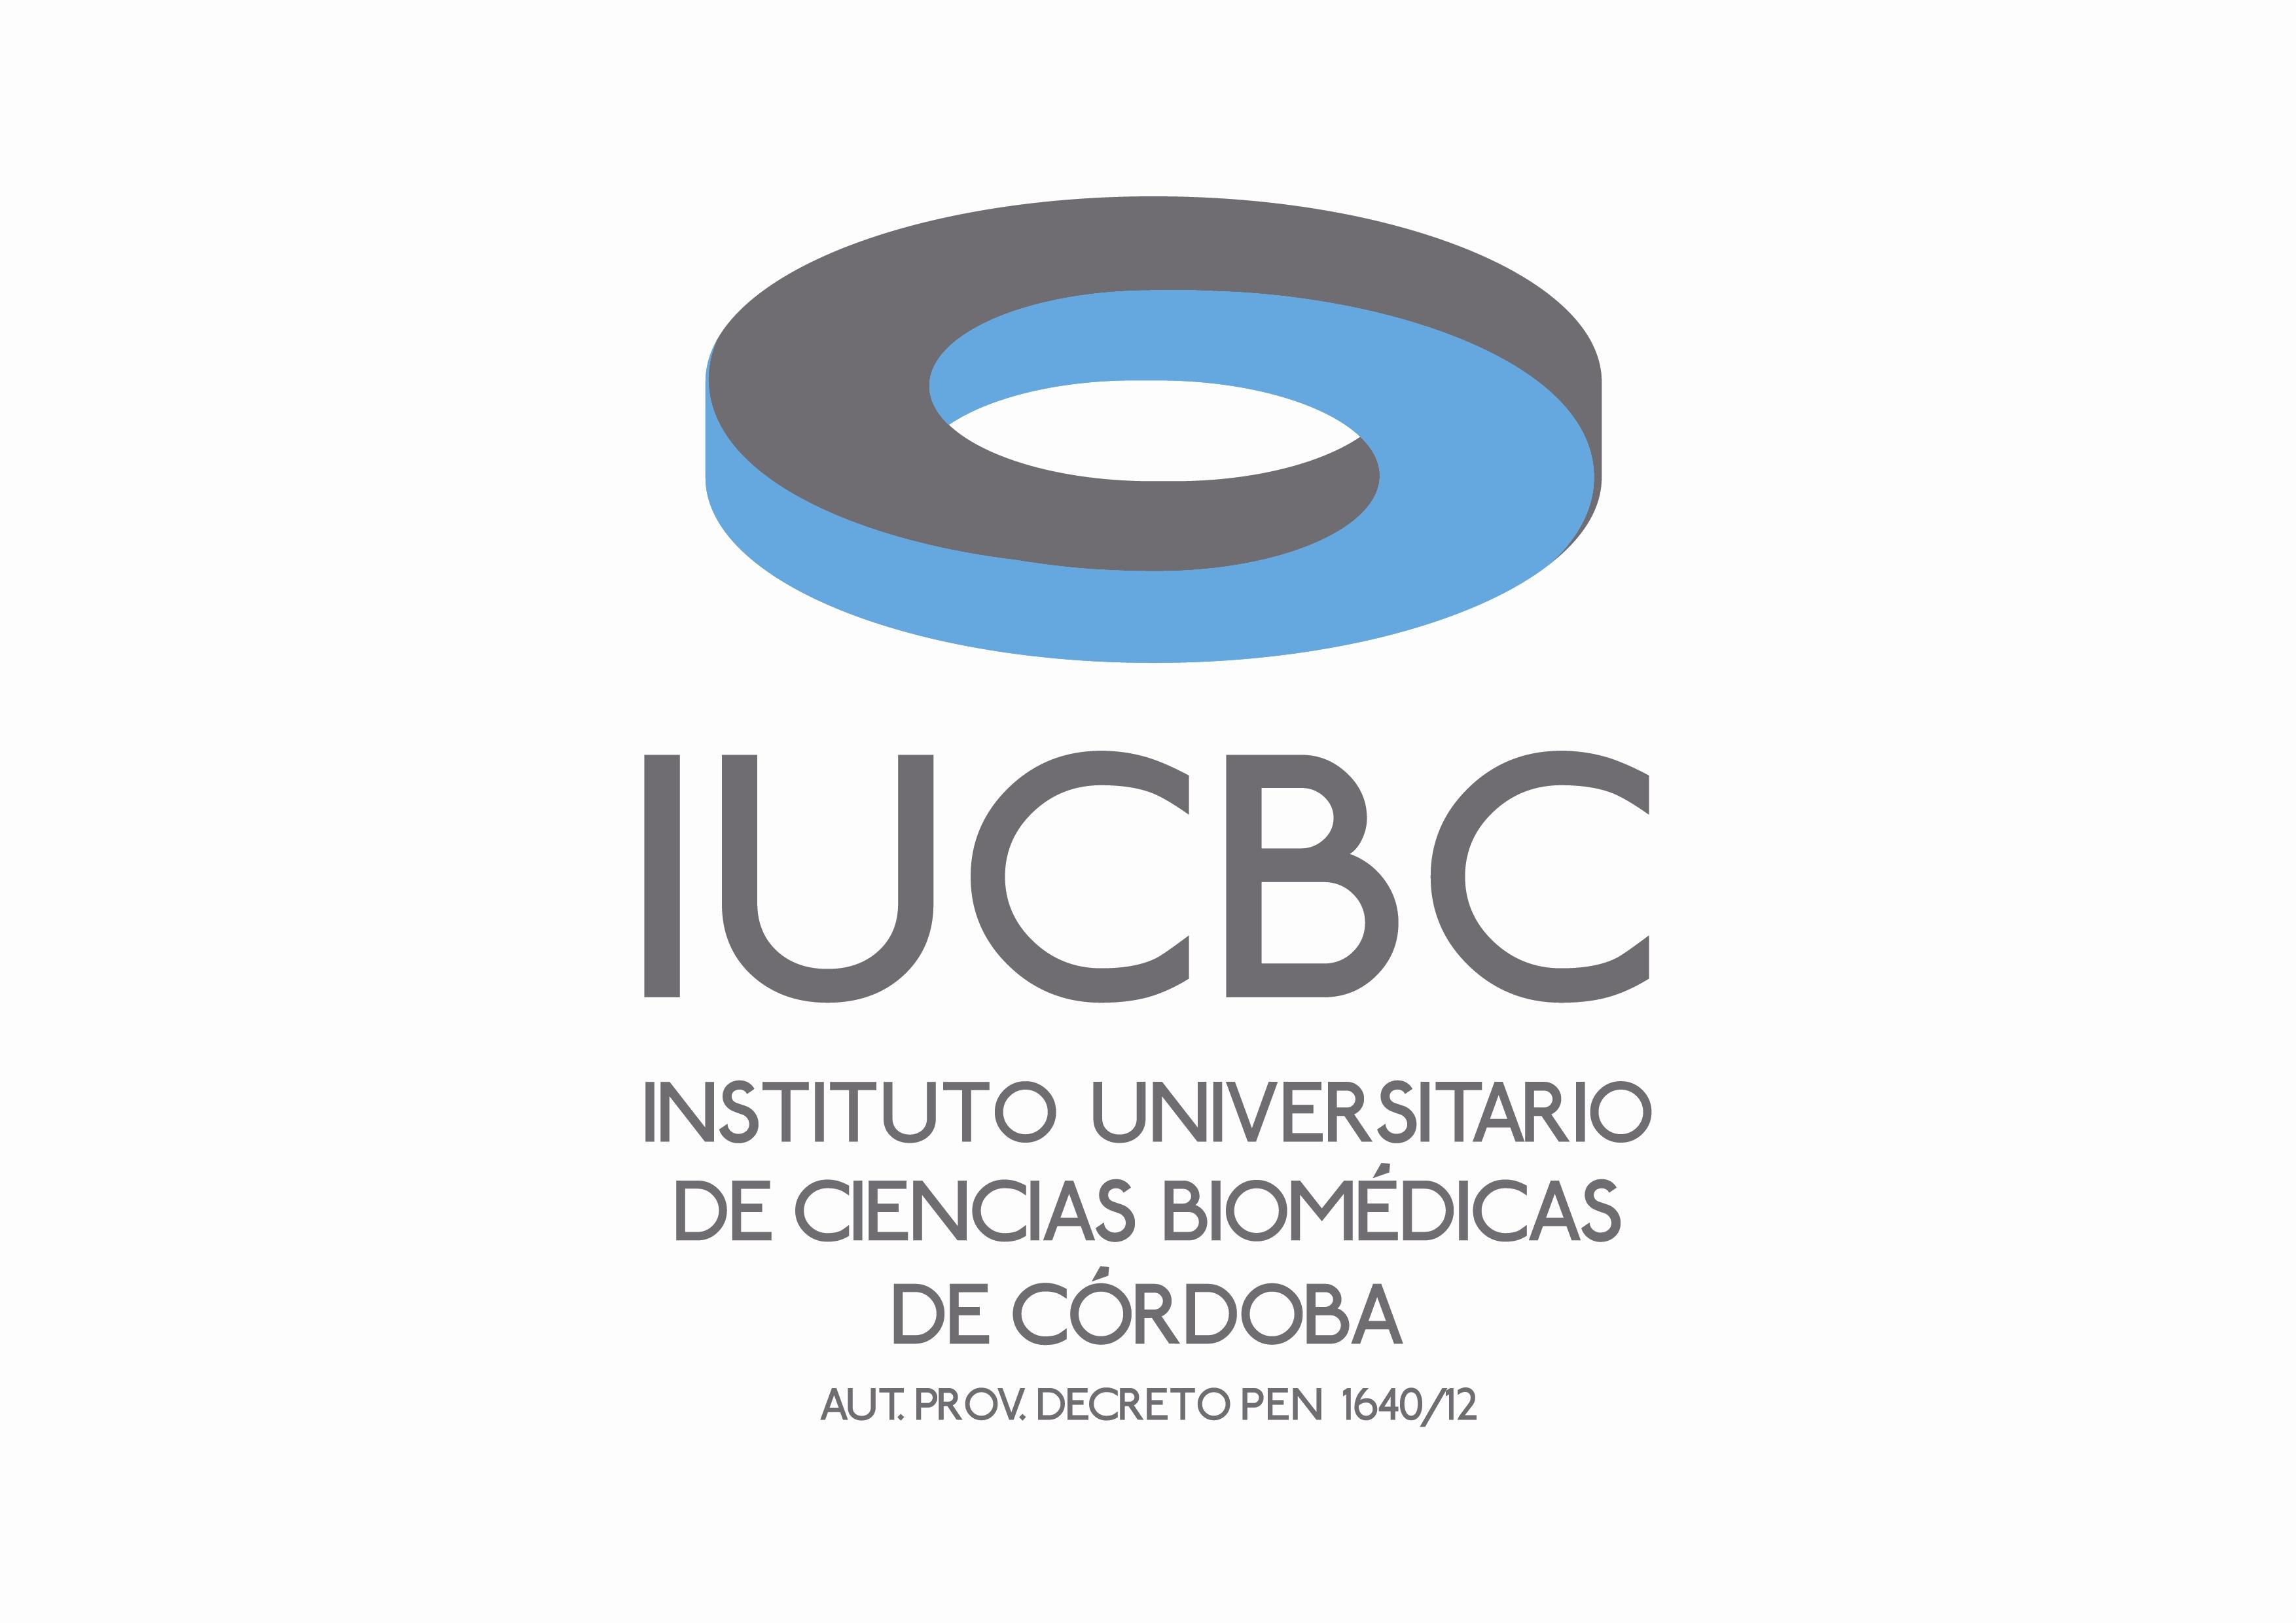 iucbc